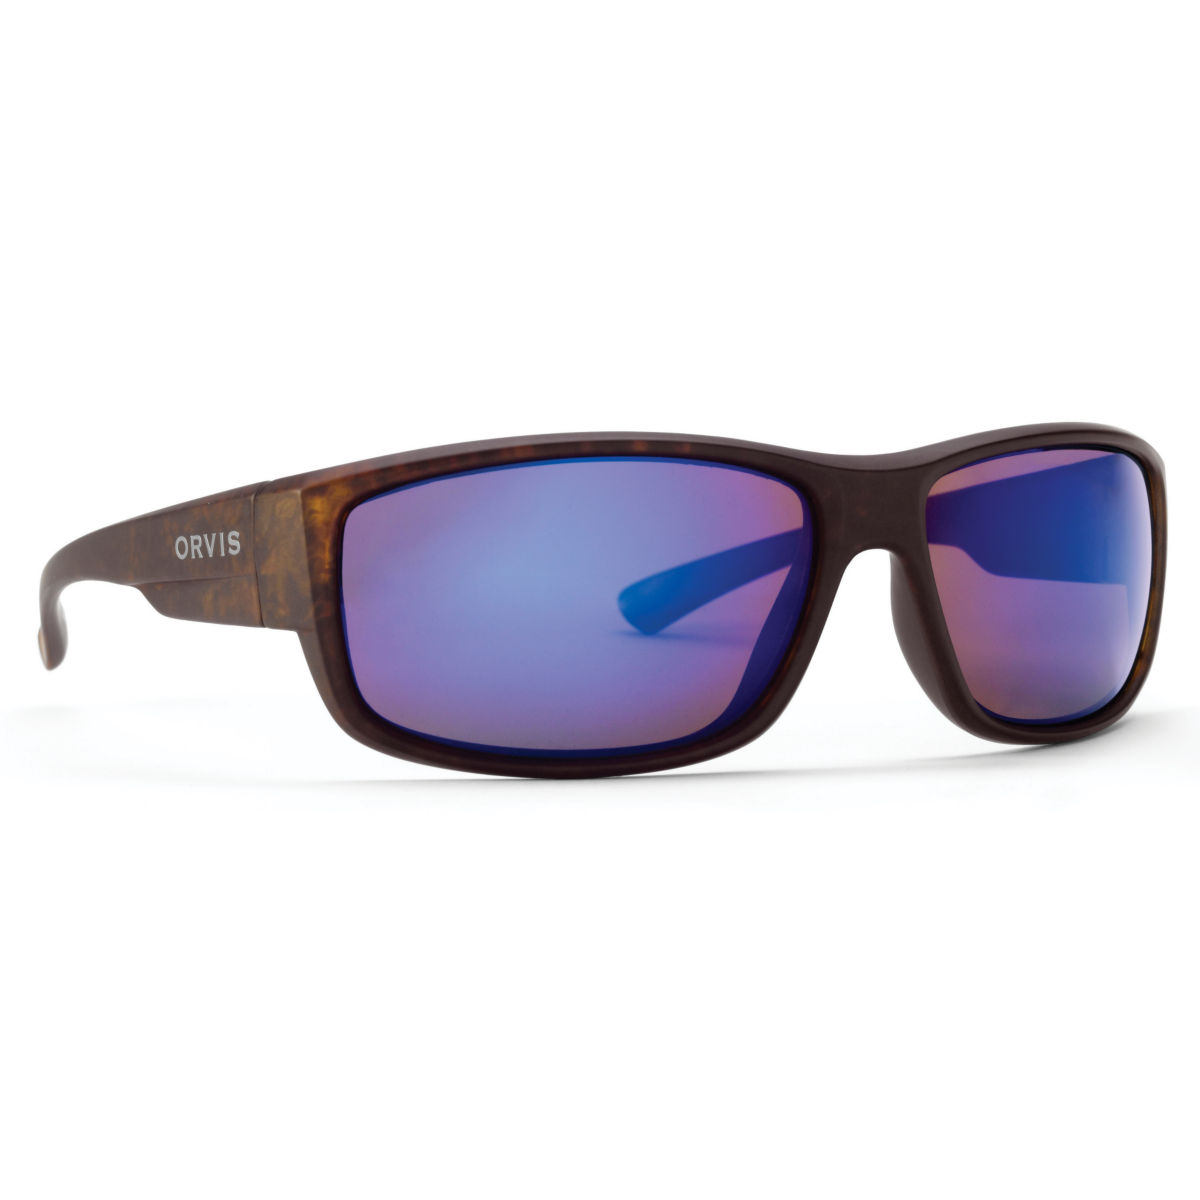 Orvis Deschutes Sunglasses - image number 0